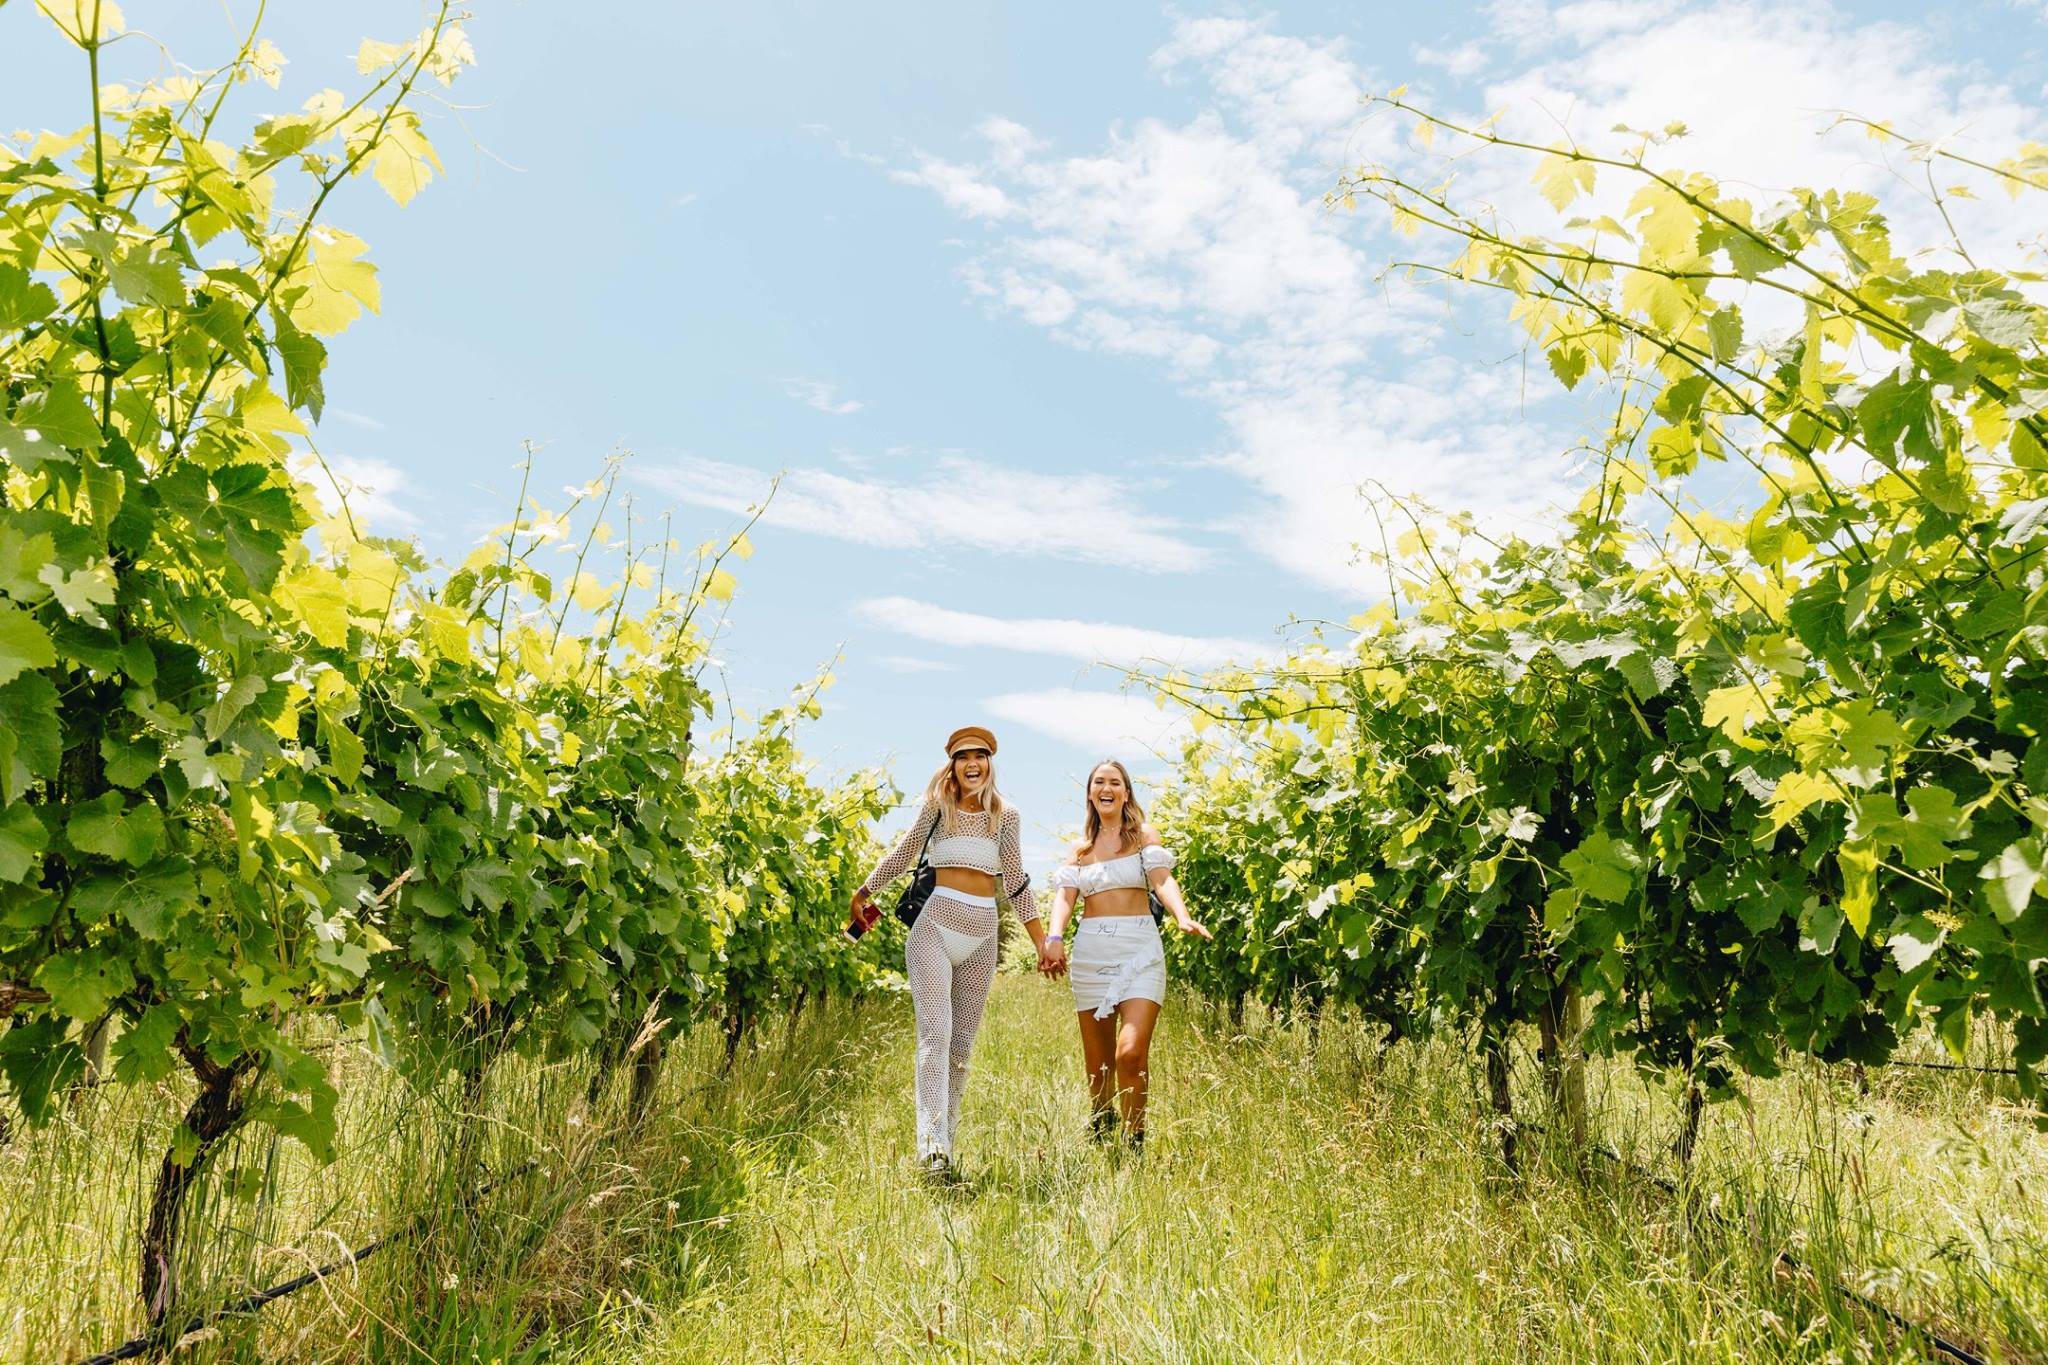 girls in vineyards.jpg